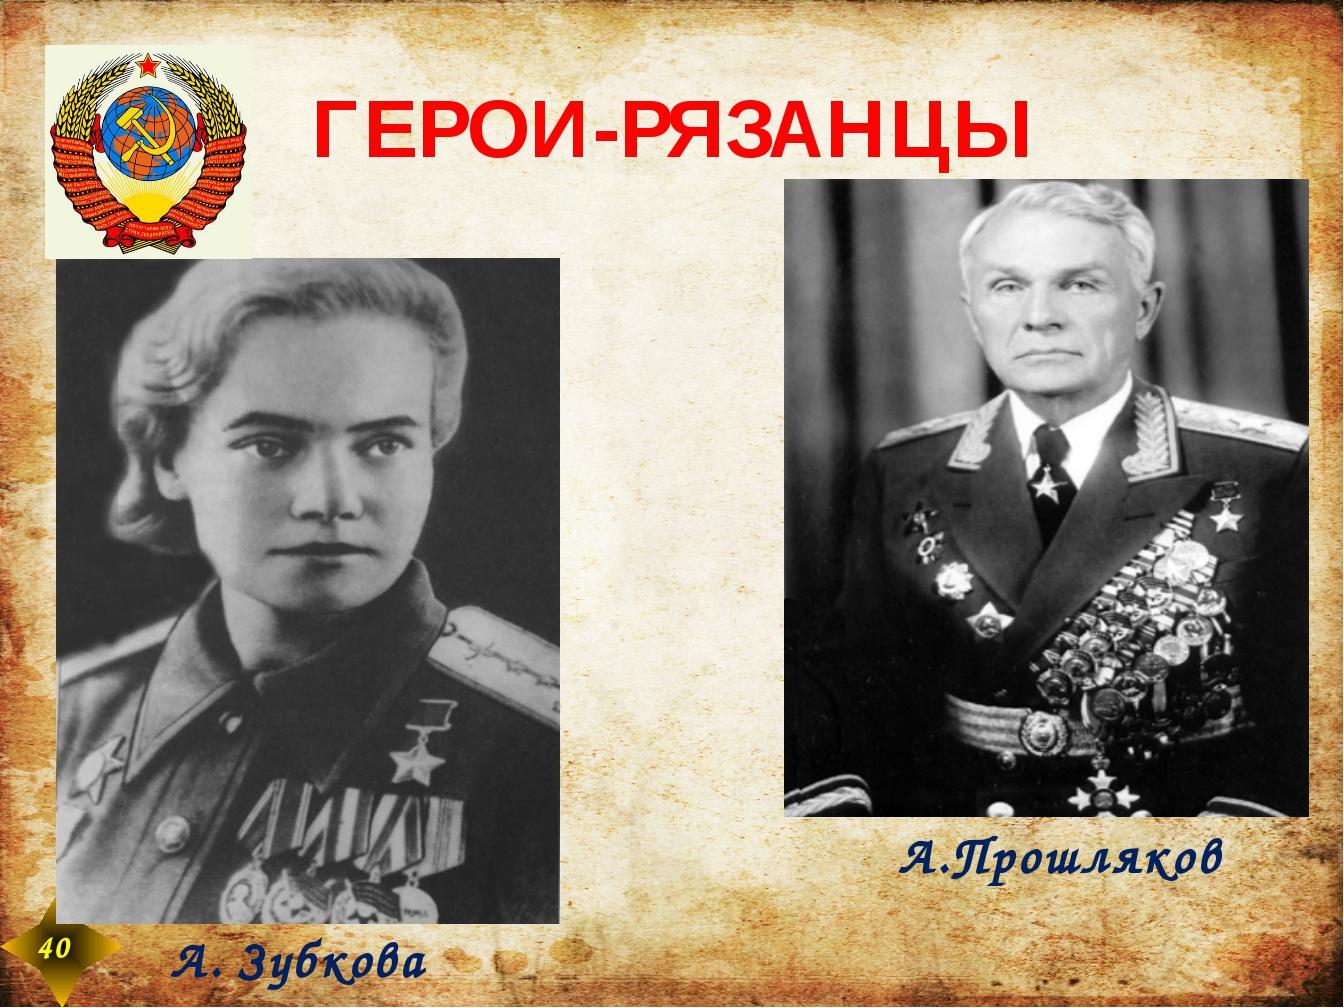 ГЕРОИ-РЯЗАНЦЫ 40 А. Зубкова А.Прошляков